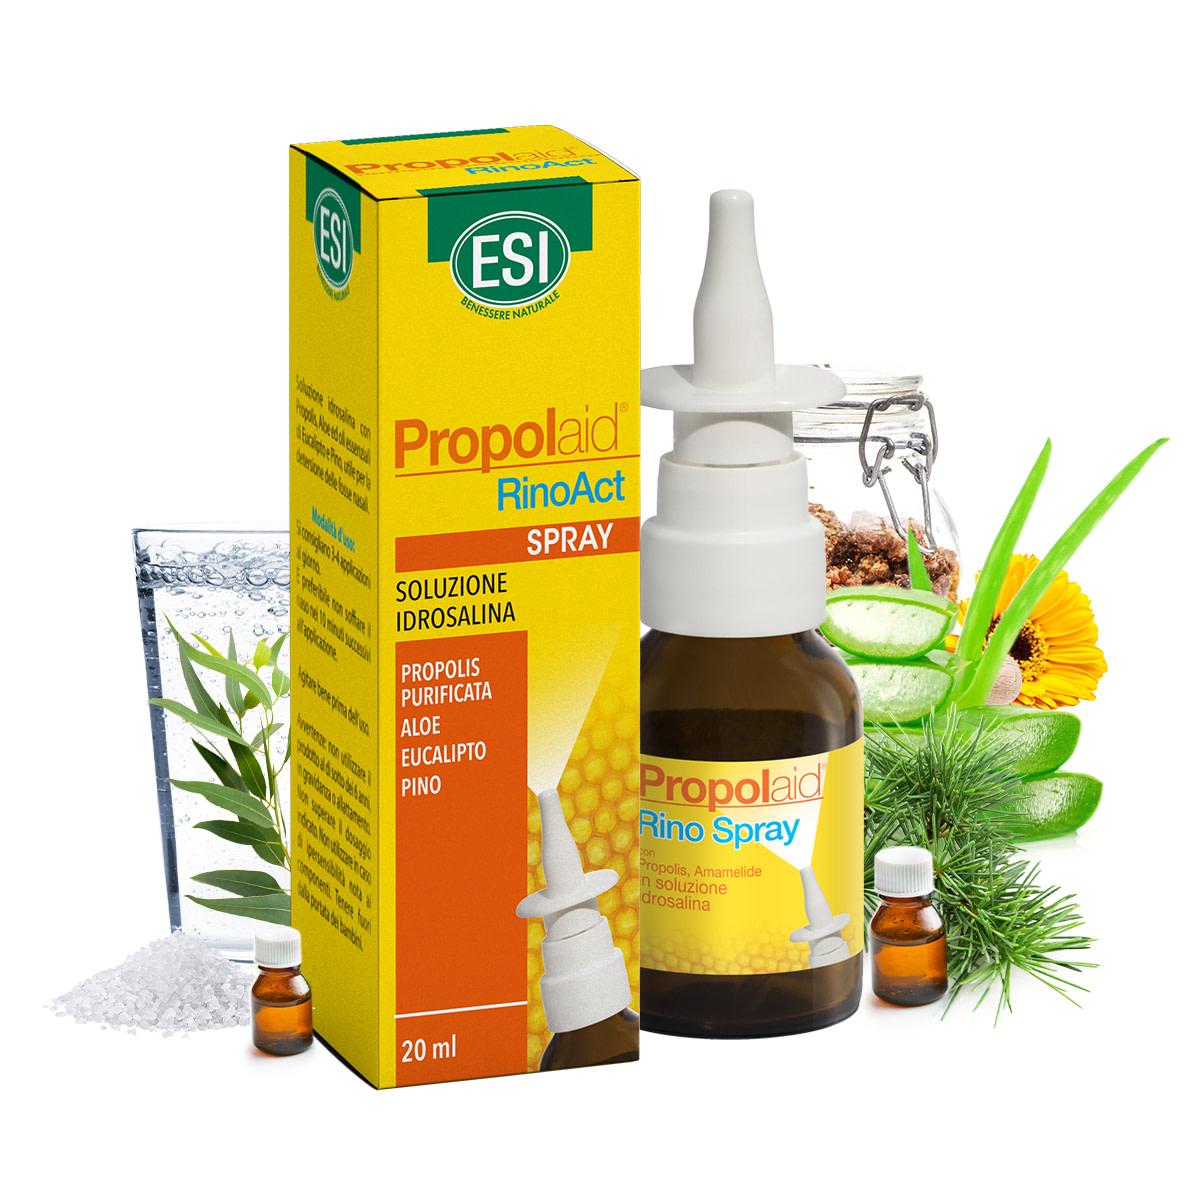 Propolaid RinoAct Spray do nosa 20 ml